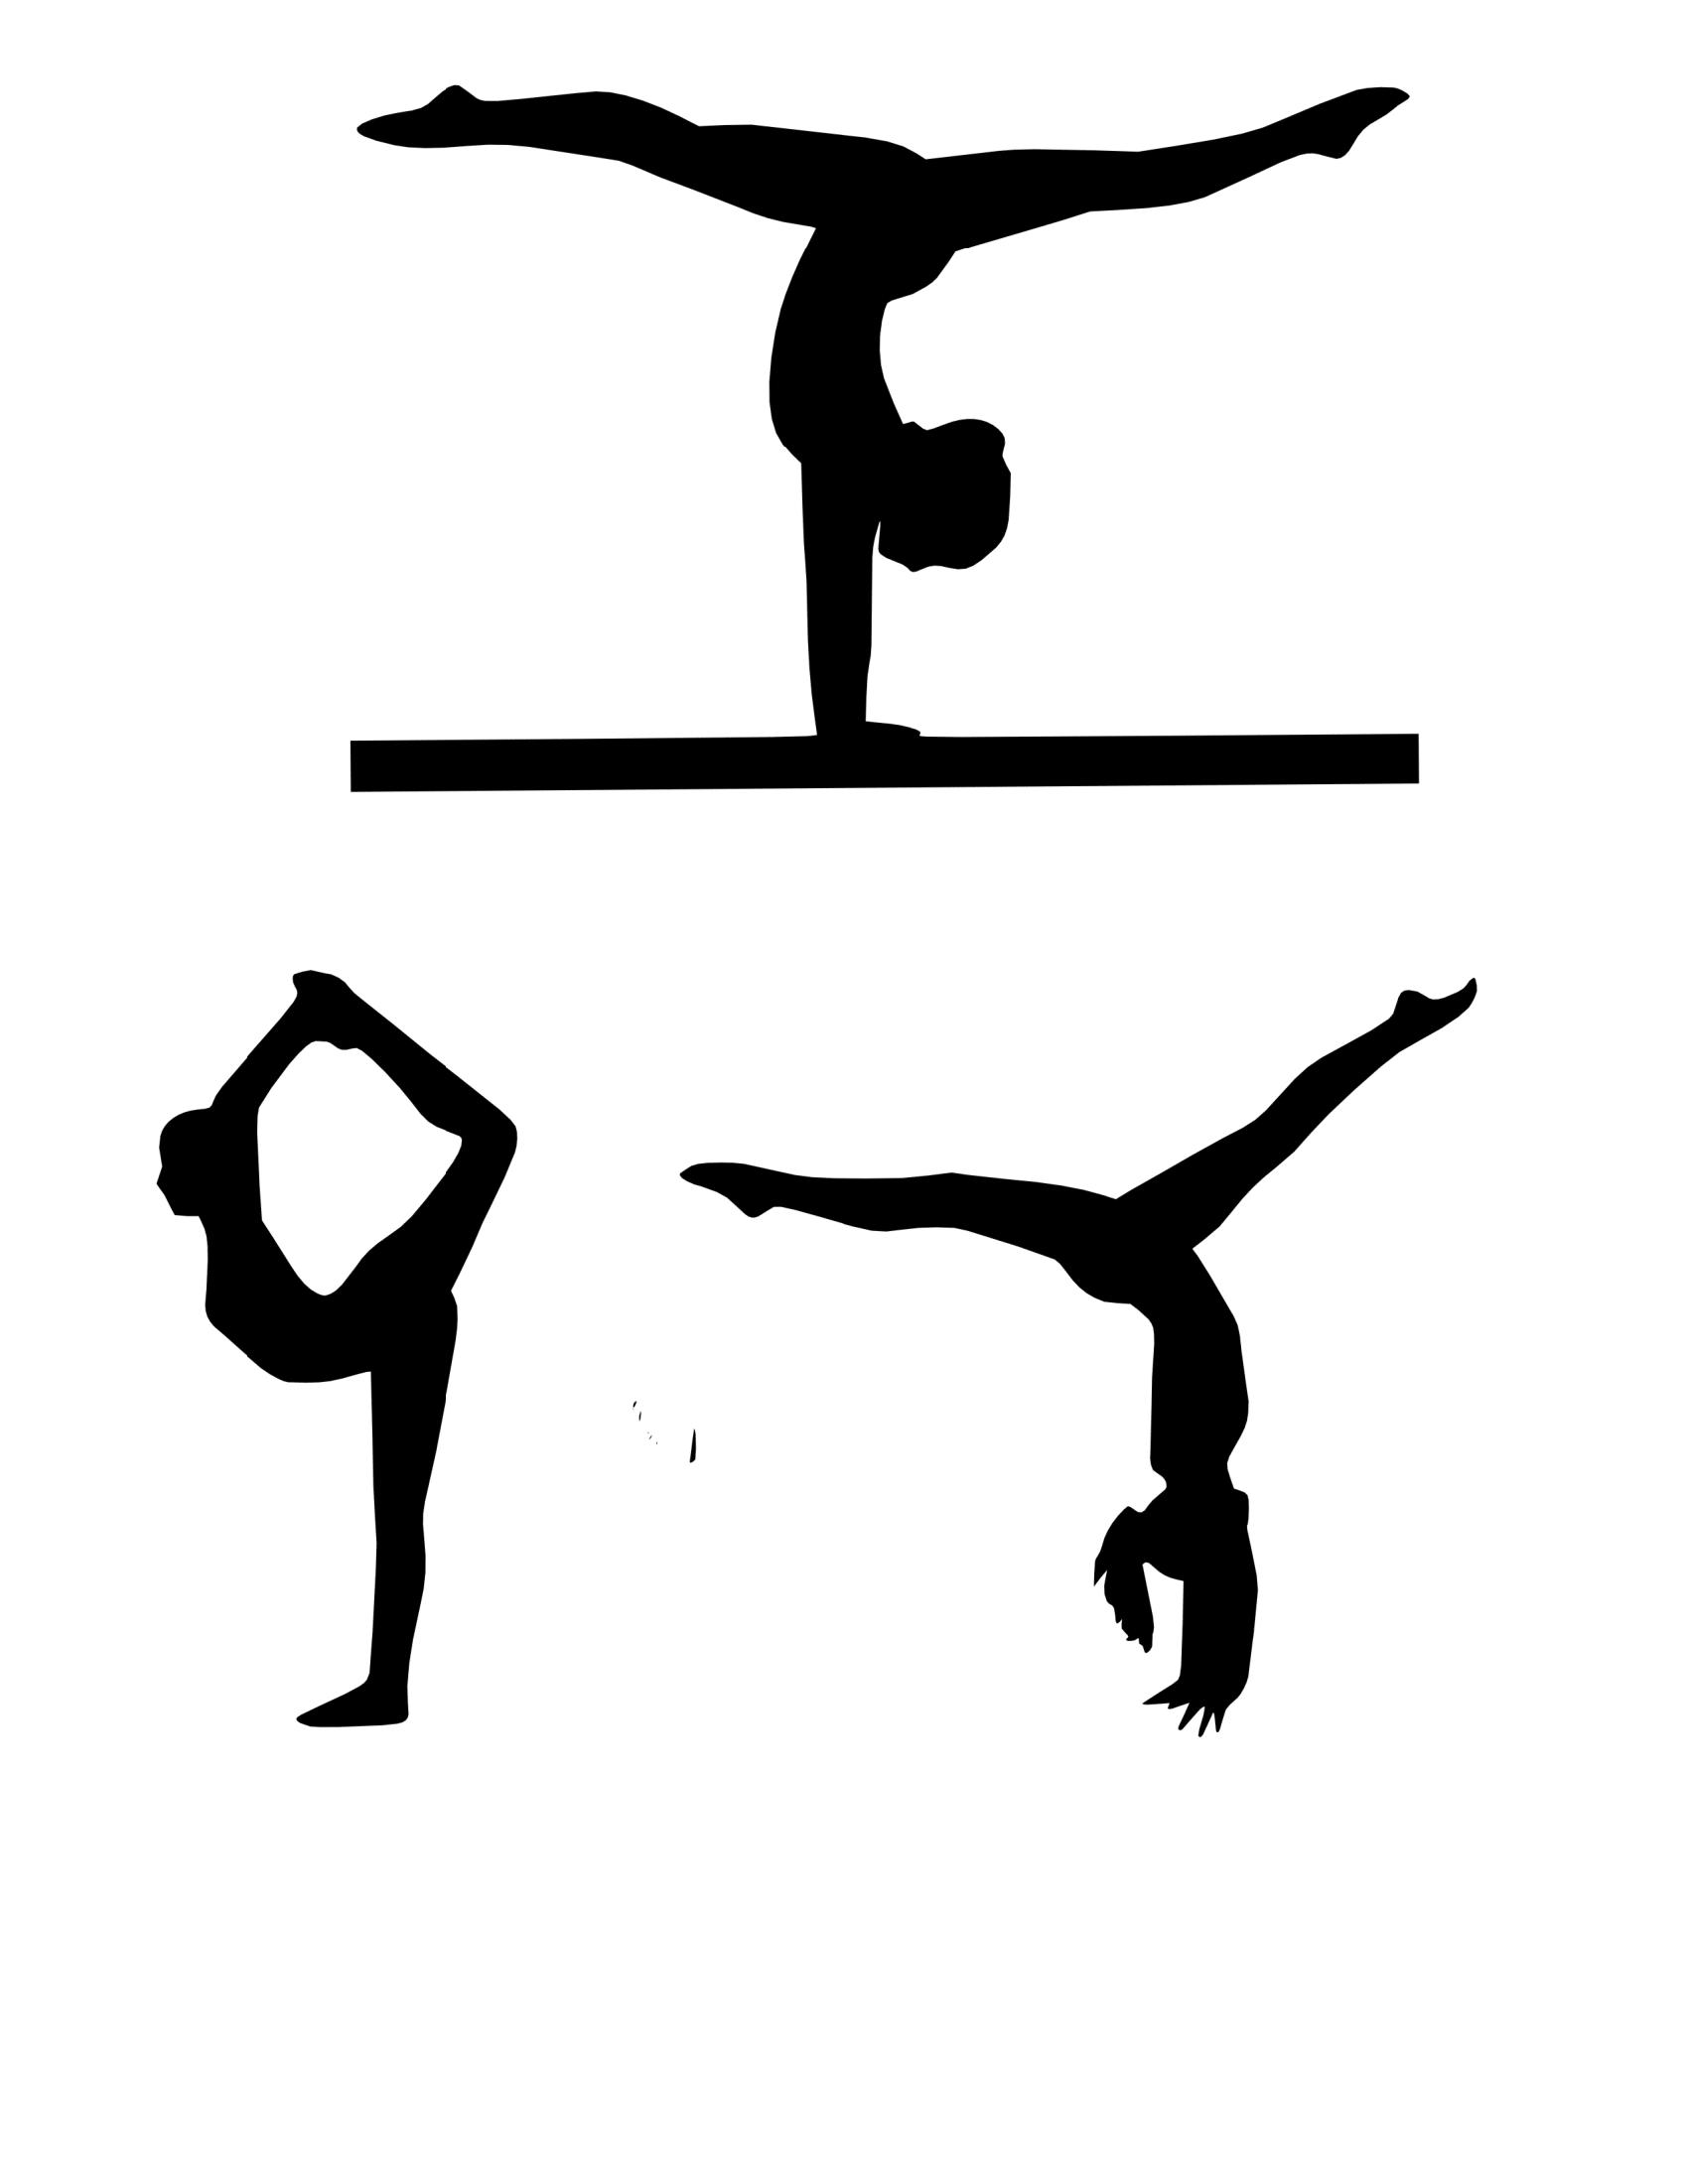 Make Thank You Ts Fun Like We Did With This Gymnastics